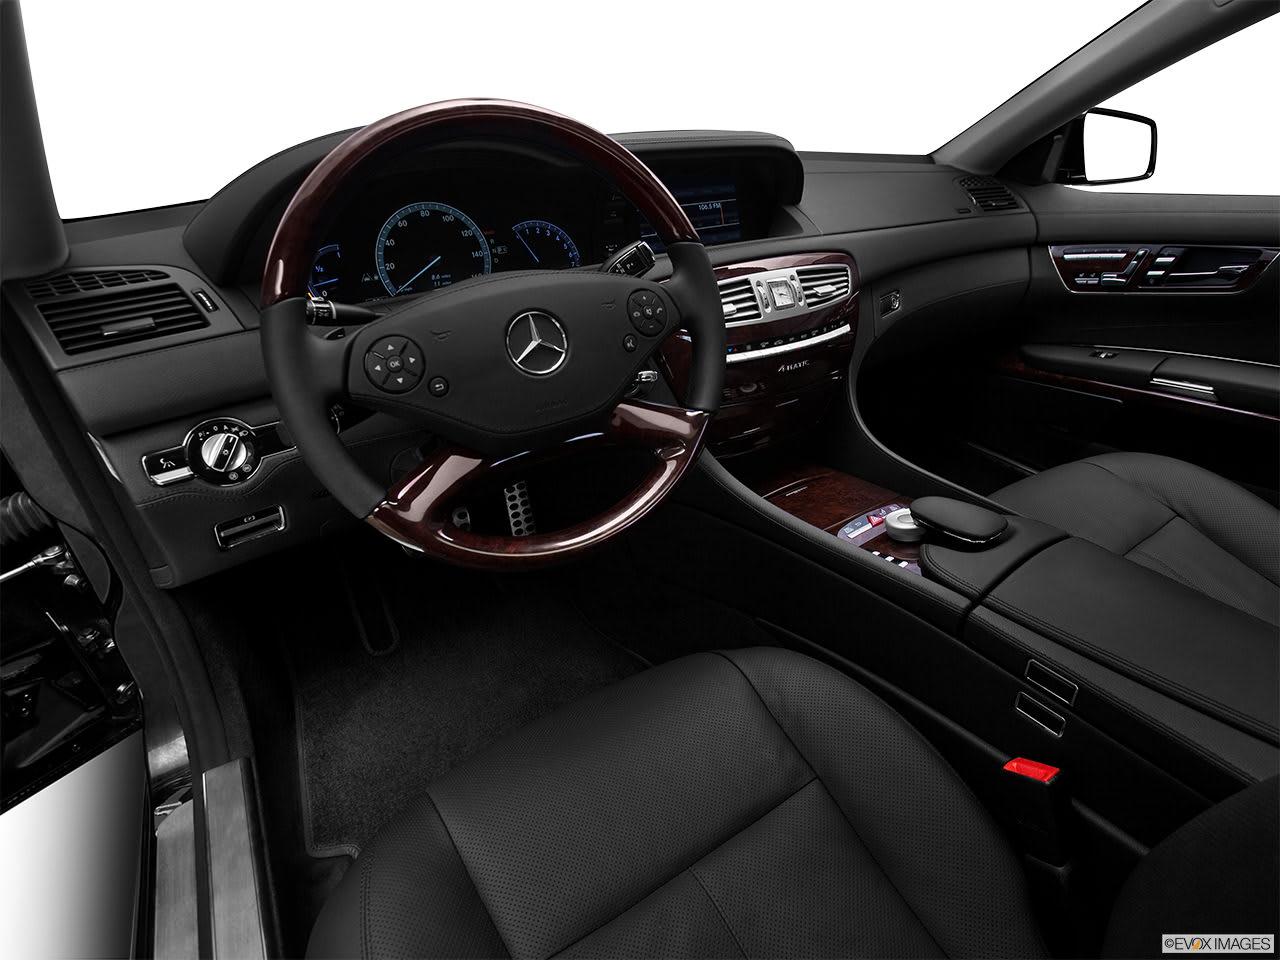 Mercedes benz CL 2012 interior